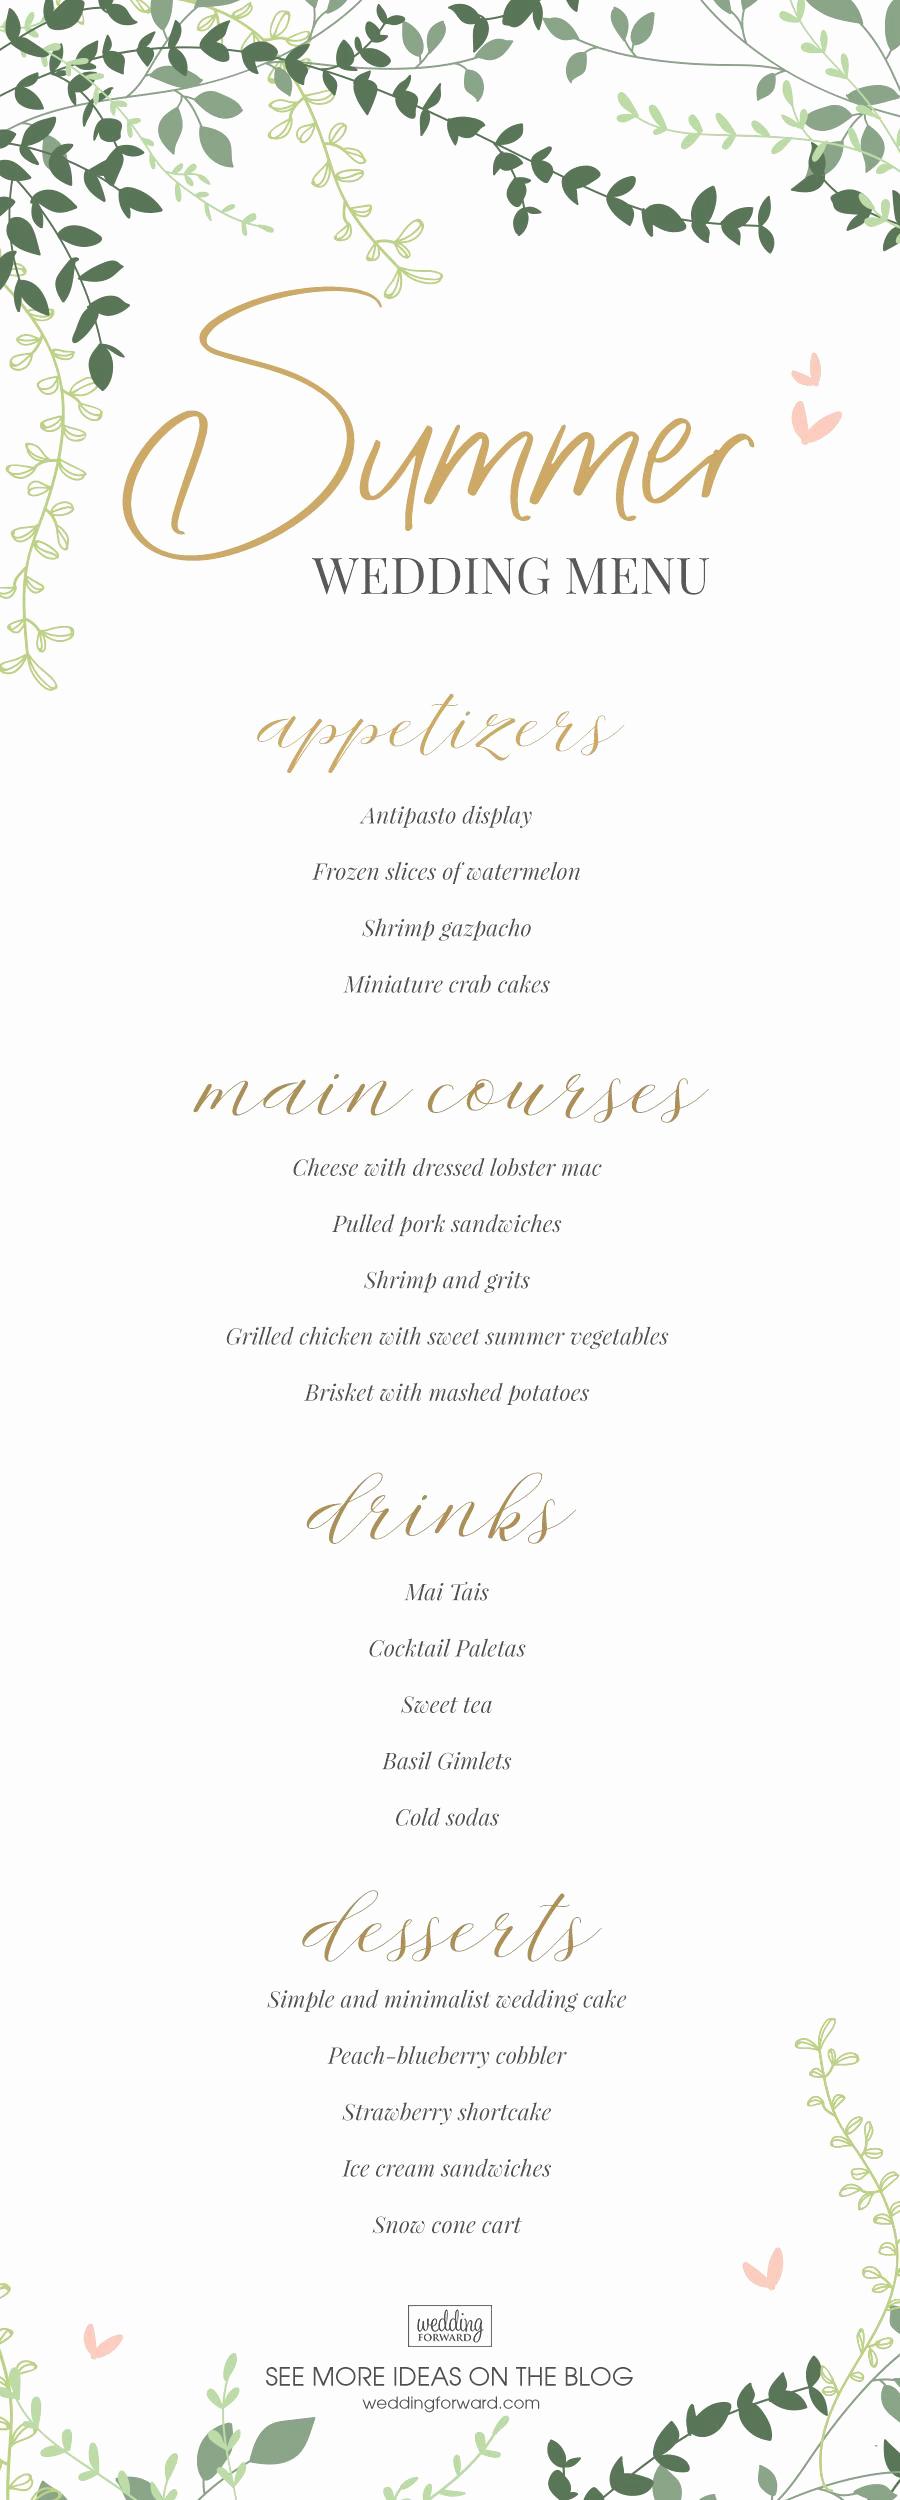 Wedding Buffet Menu Template Elegant top Wedding Menu Ideas In 2020 and Tips